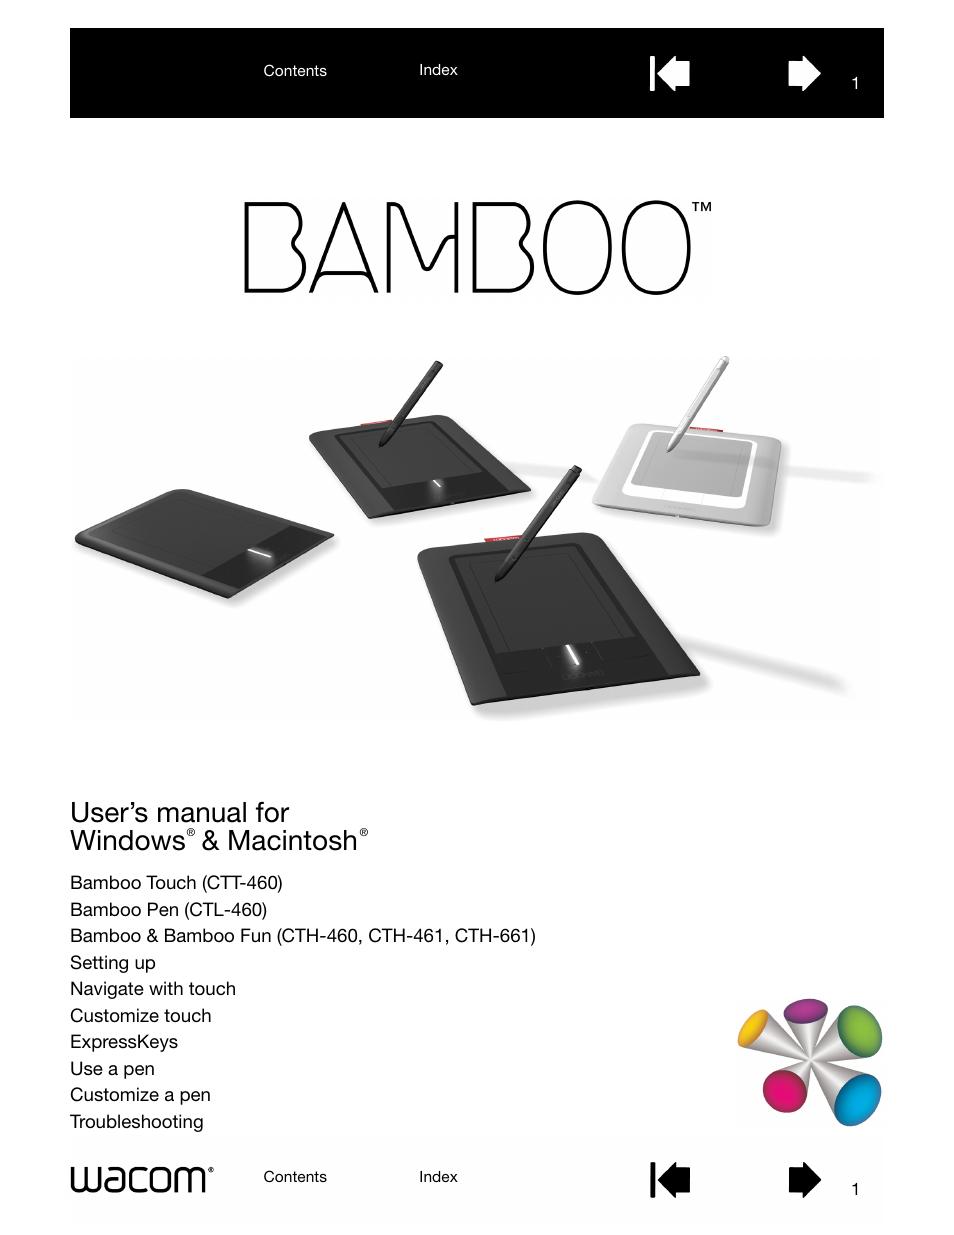 wacom bamboo ctl 460 user manual 90 pages rh manualsdir com wacom bamboo spark user manual wacom bamboo slate user manual